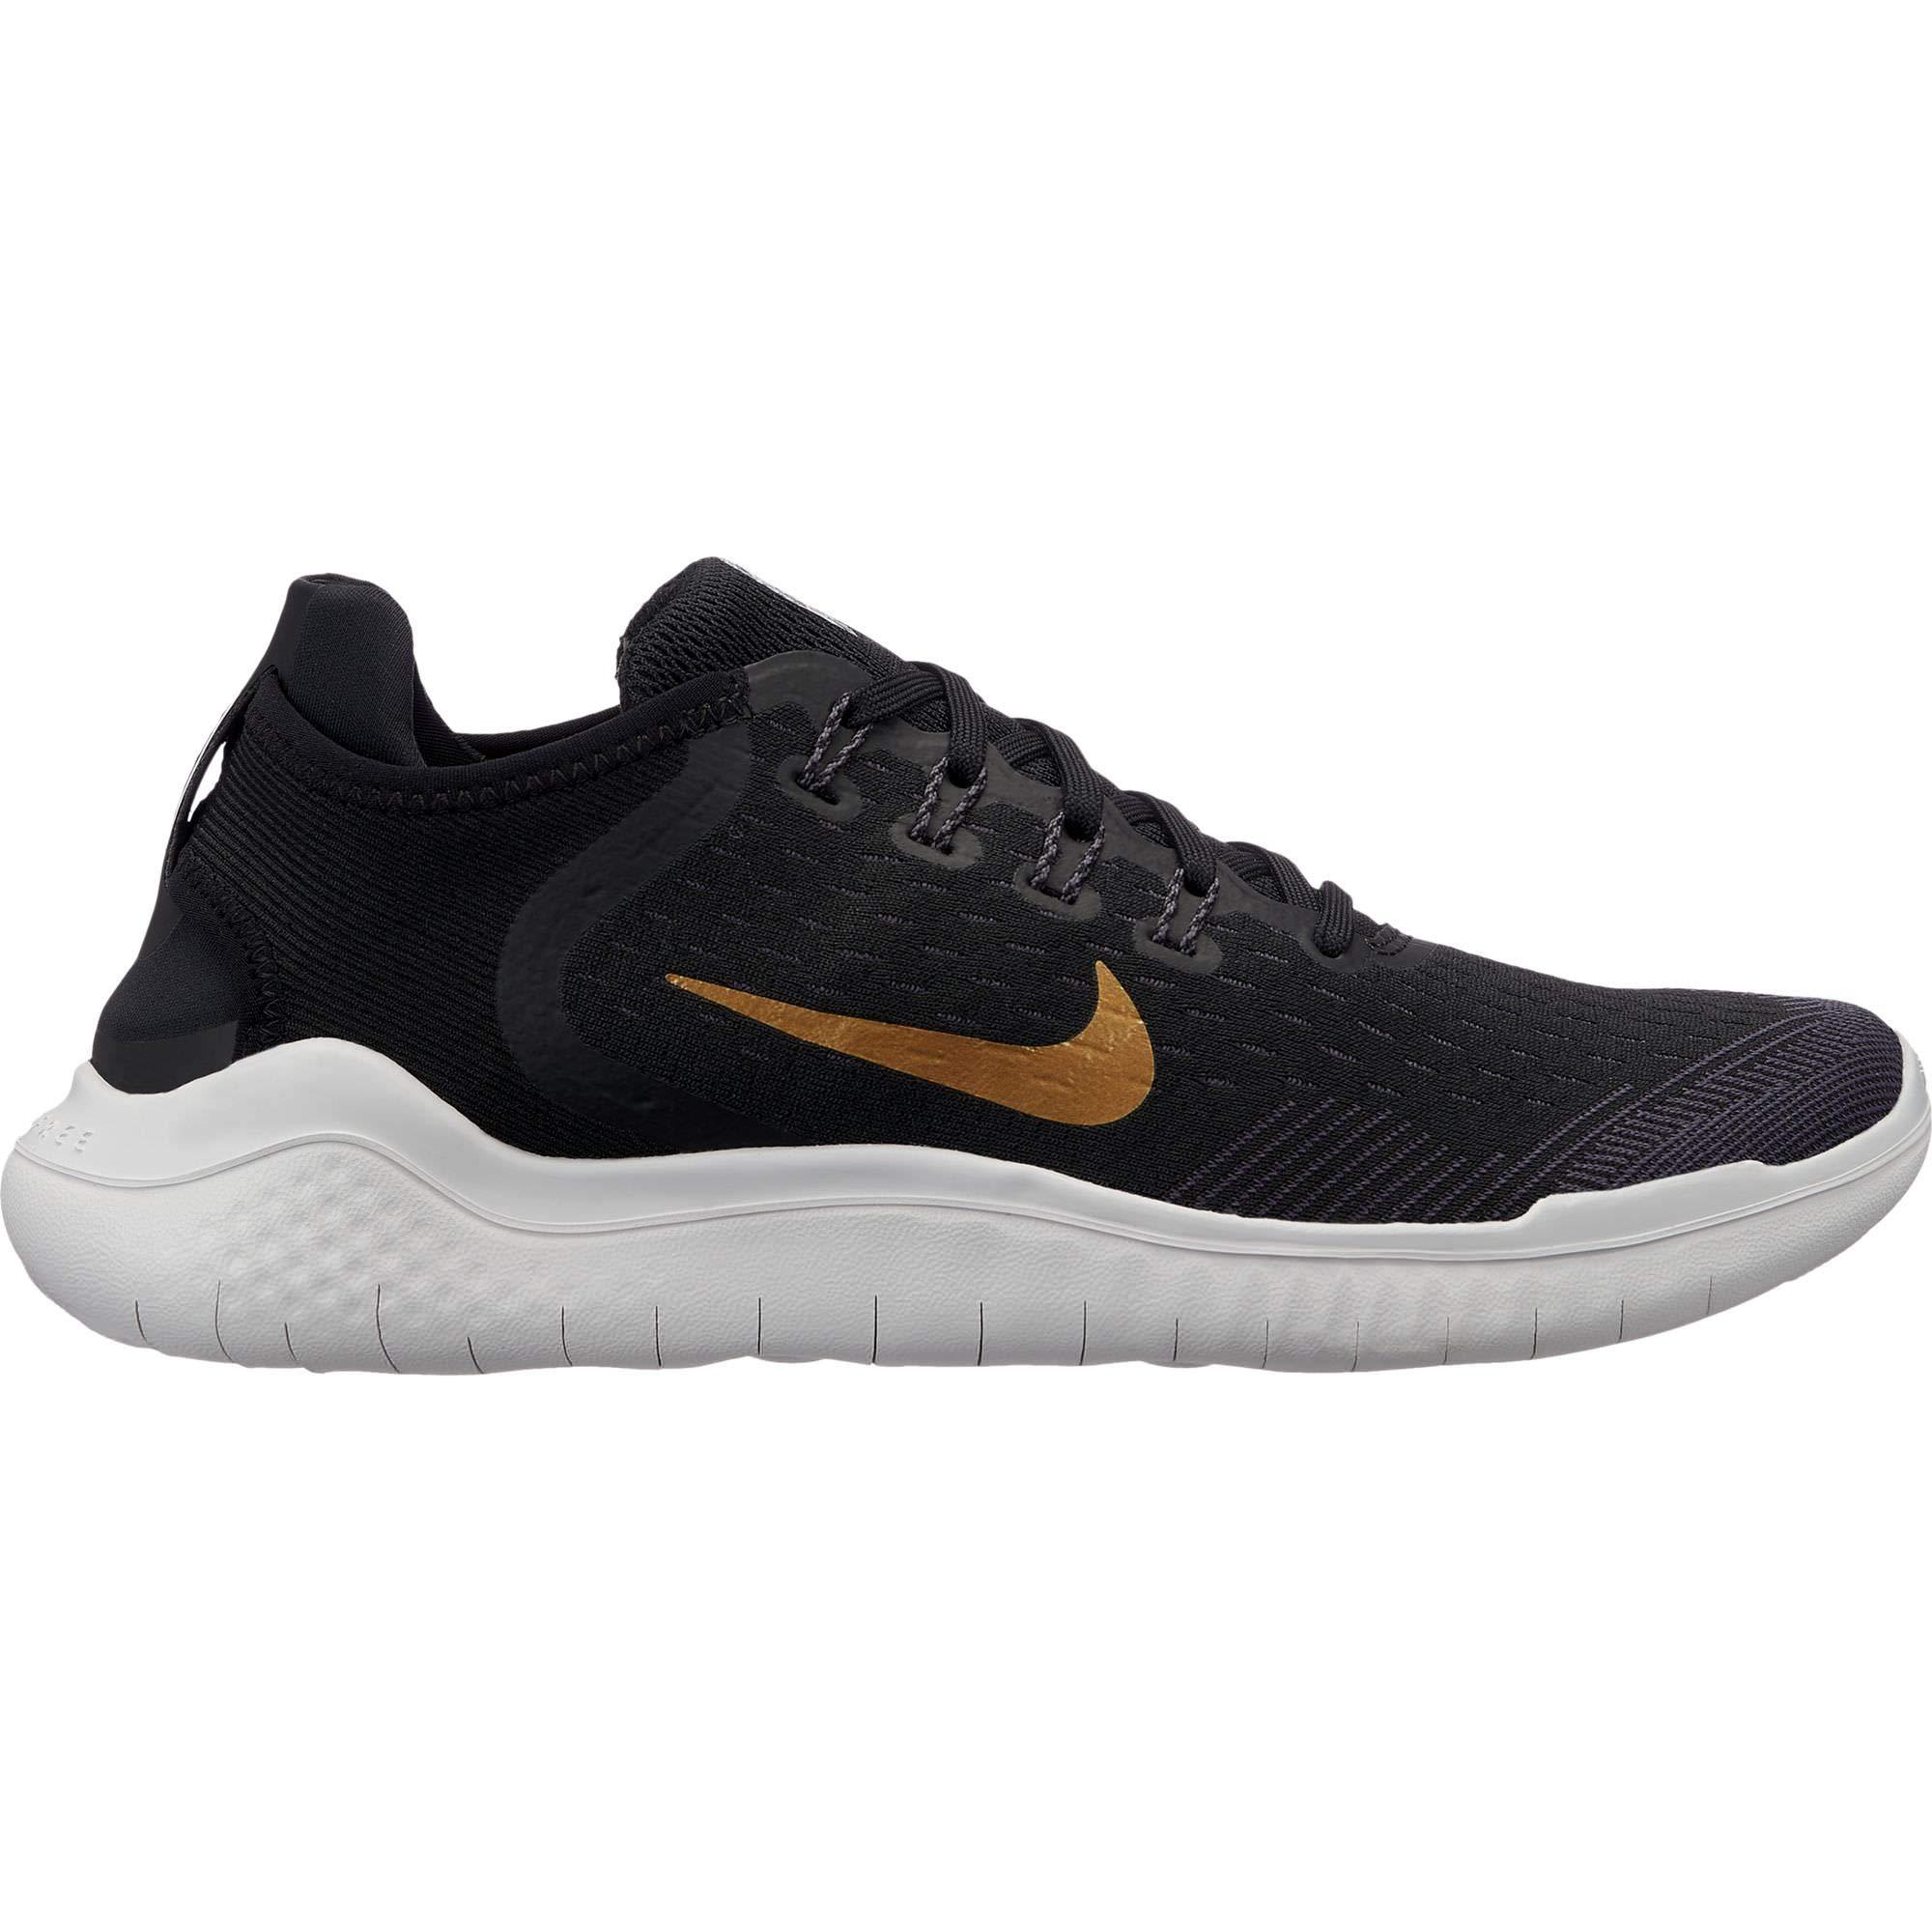 4ae0e94d6d77 Nike Free Rn 2018 Sz 10.5 Womens Running Black Metallic Gold-Vast Grey Shoes